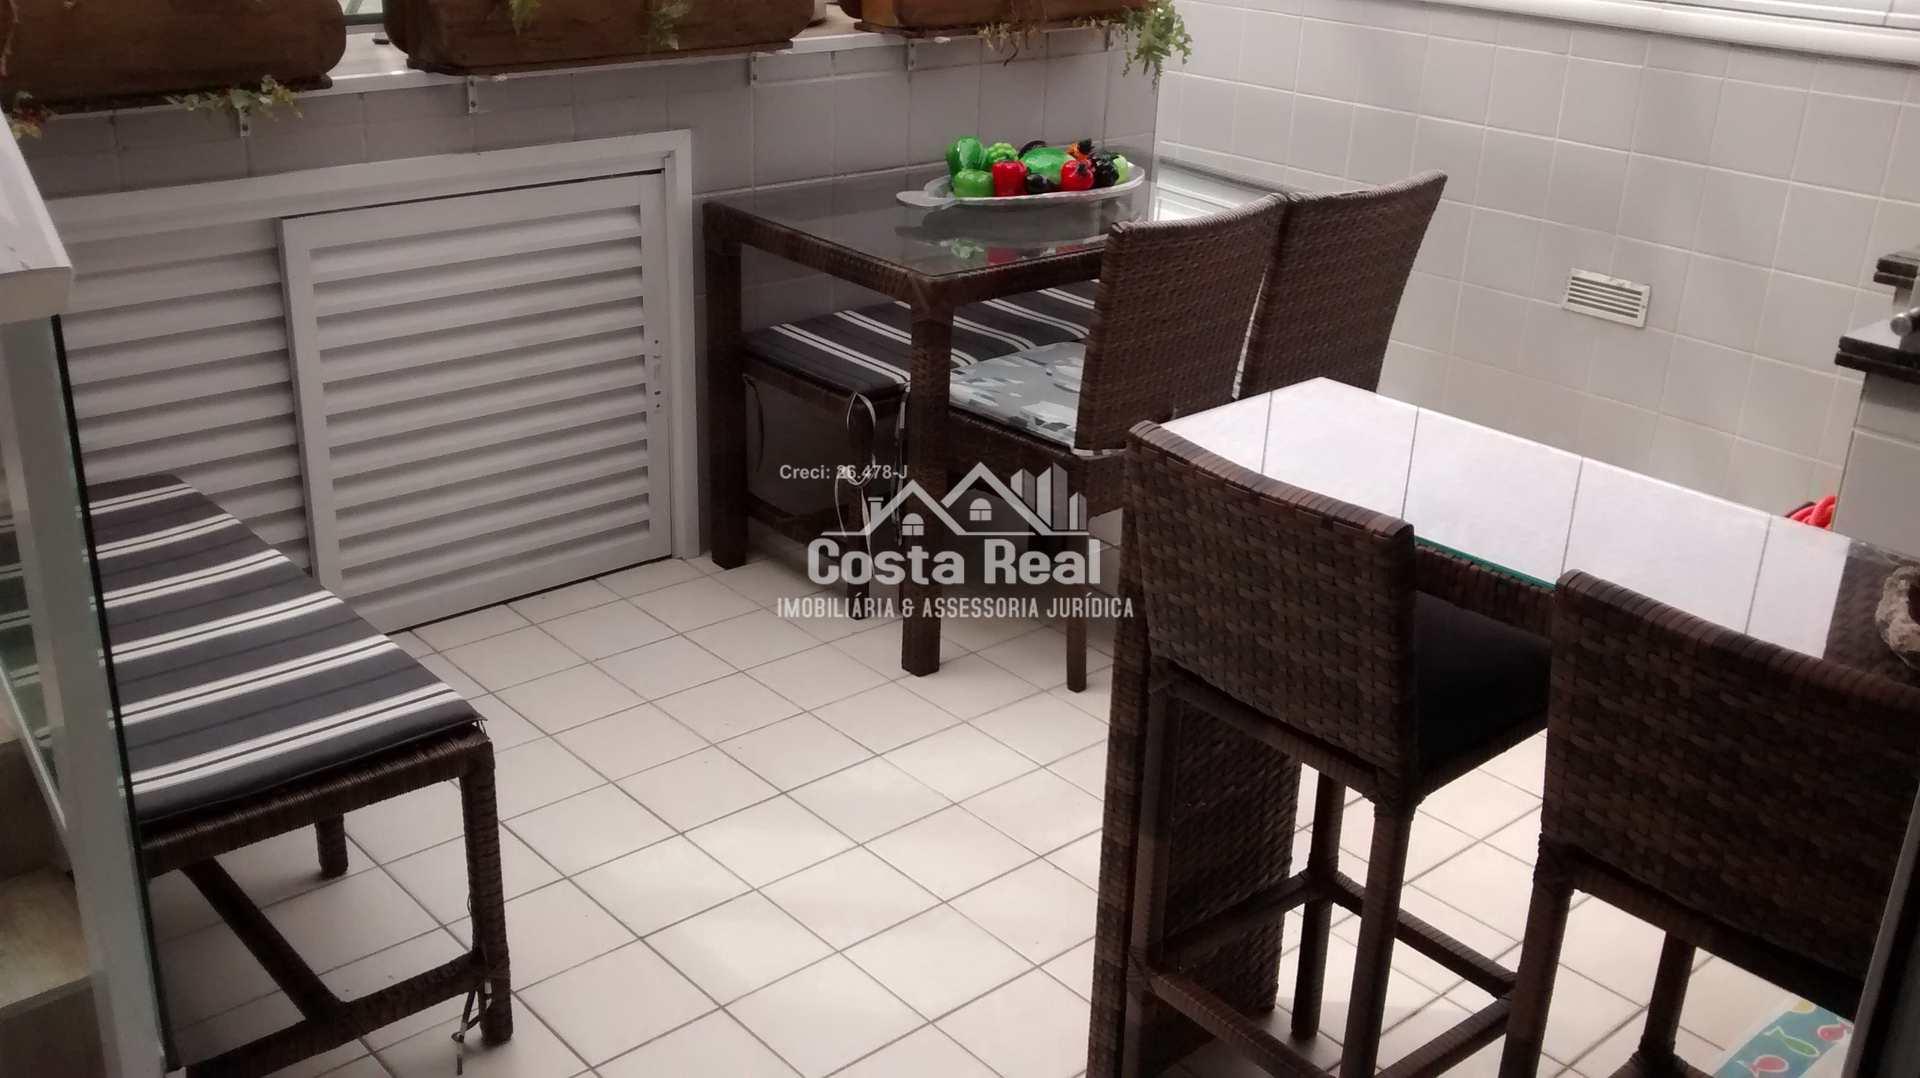 Cobertura com 4 dorms, Tupi, Praia Grande - R$ 2 mi, Cod: 954